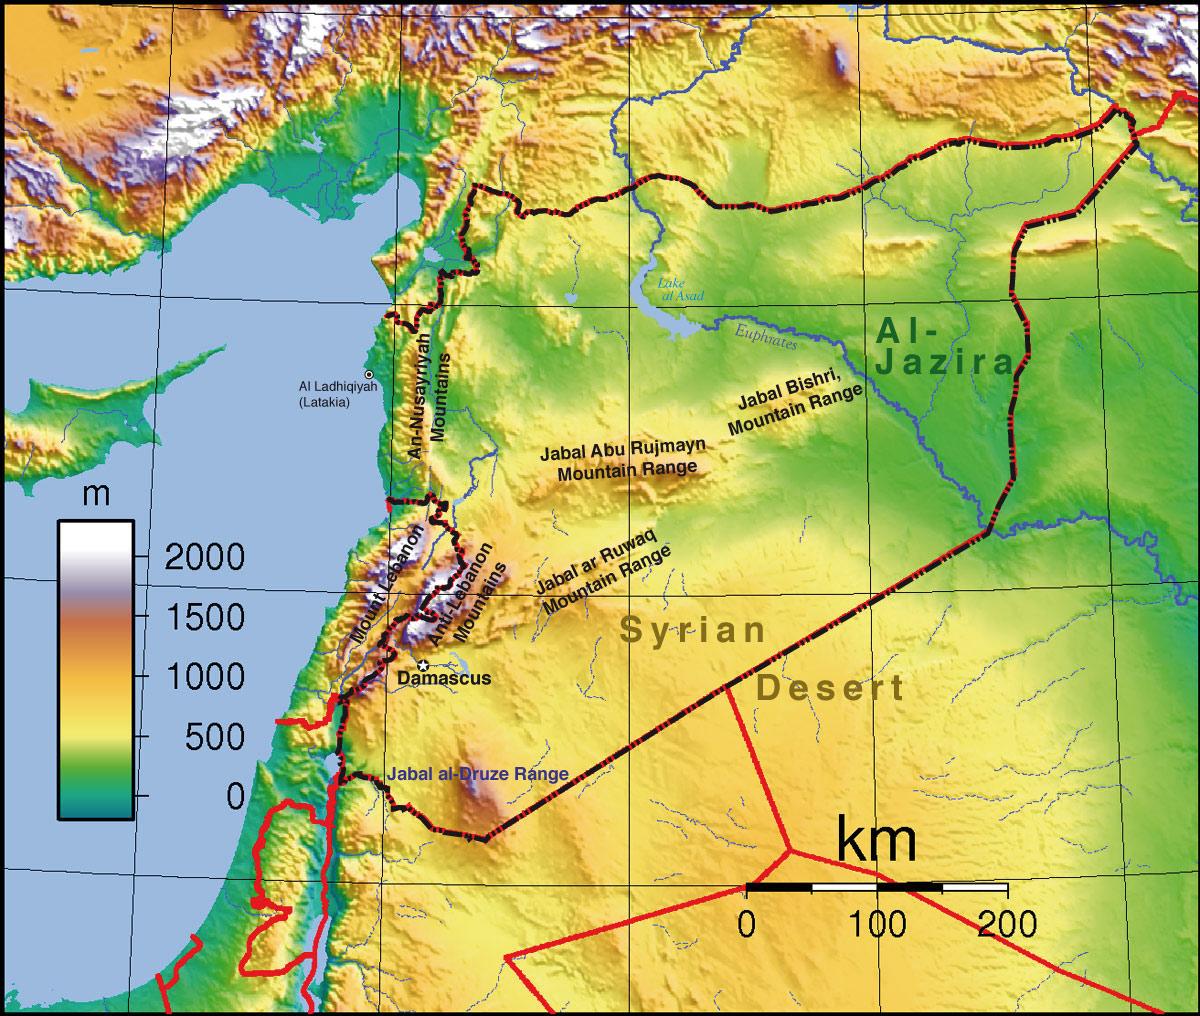 https://i0.wp.com/www.nationsonline.org/maps/Syria-Topographic-Map.jpg